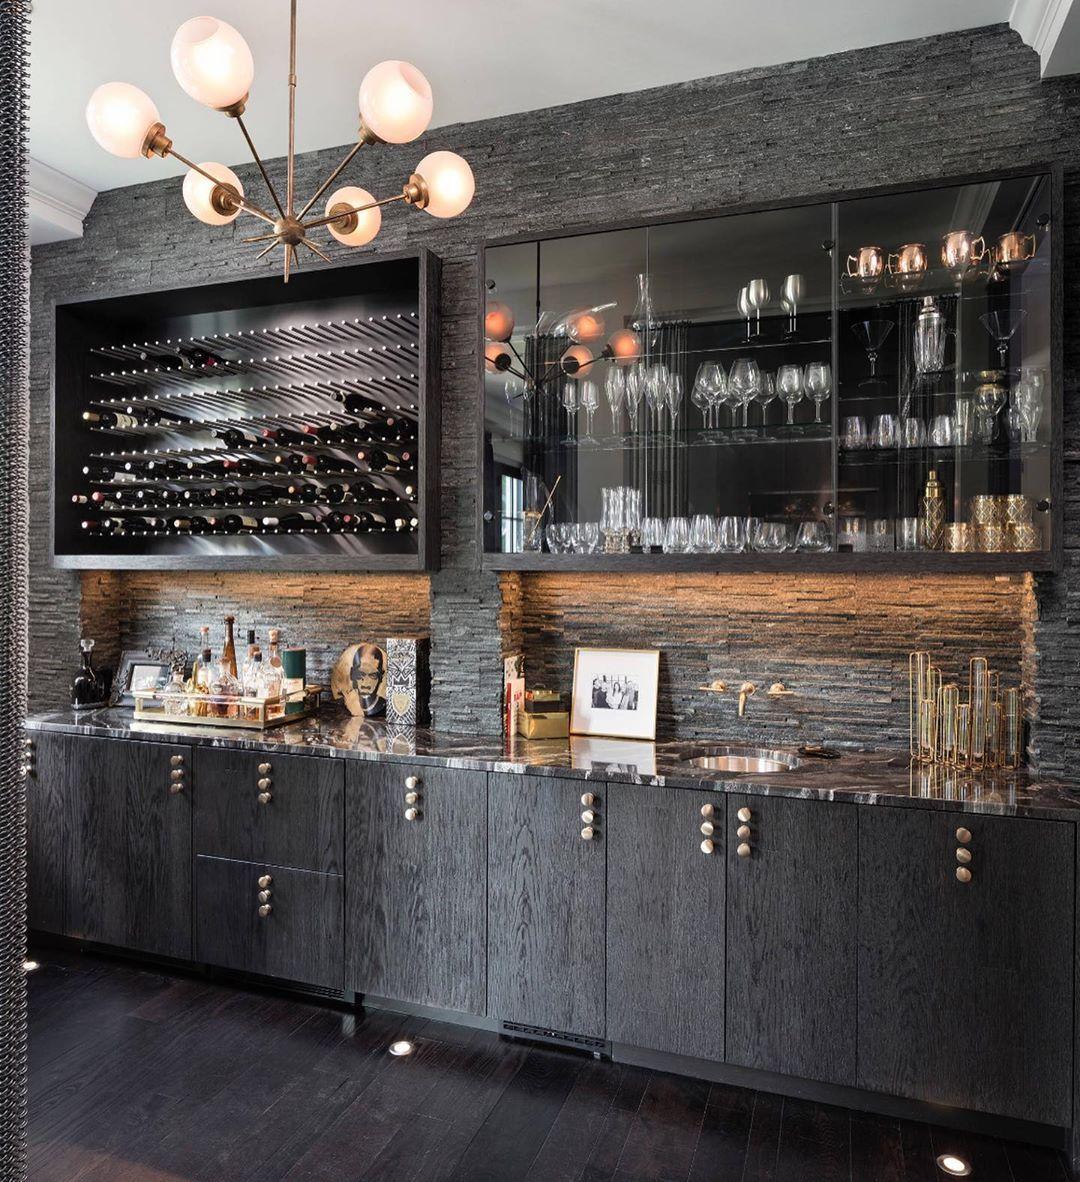 Designer Homeinterior Design: Cheap Ways To Make Over Your Home